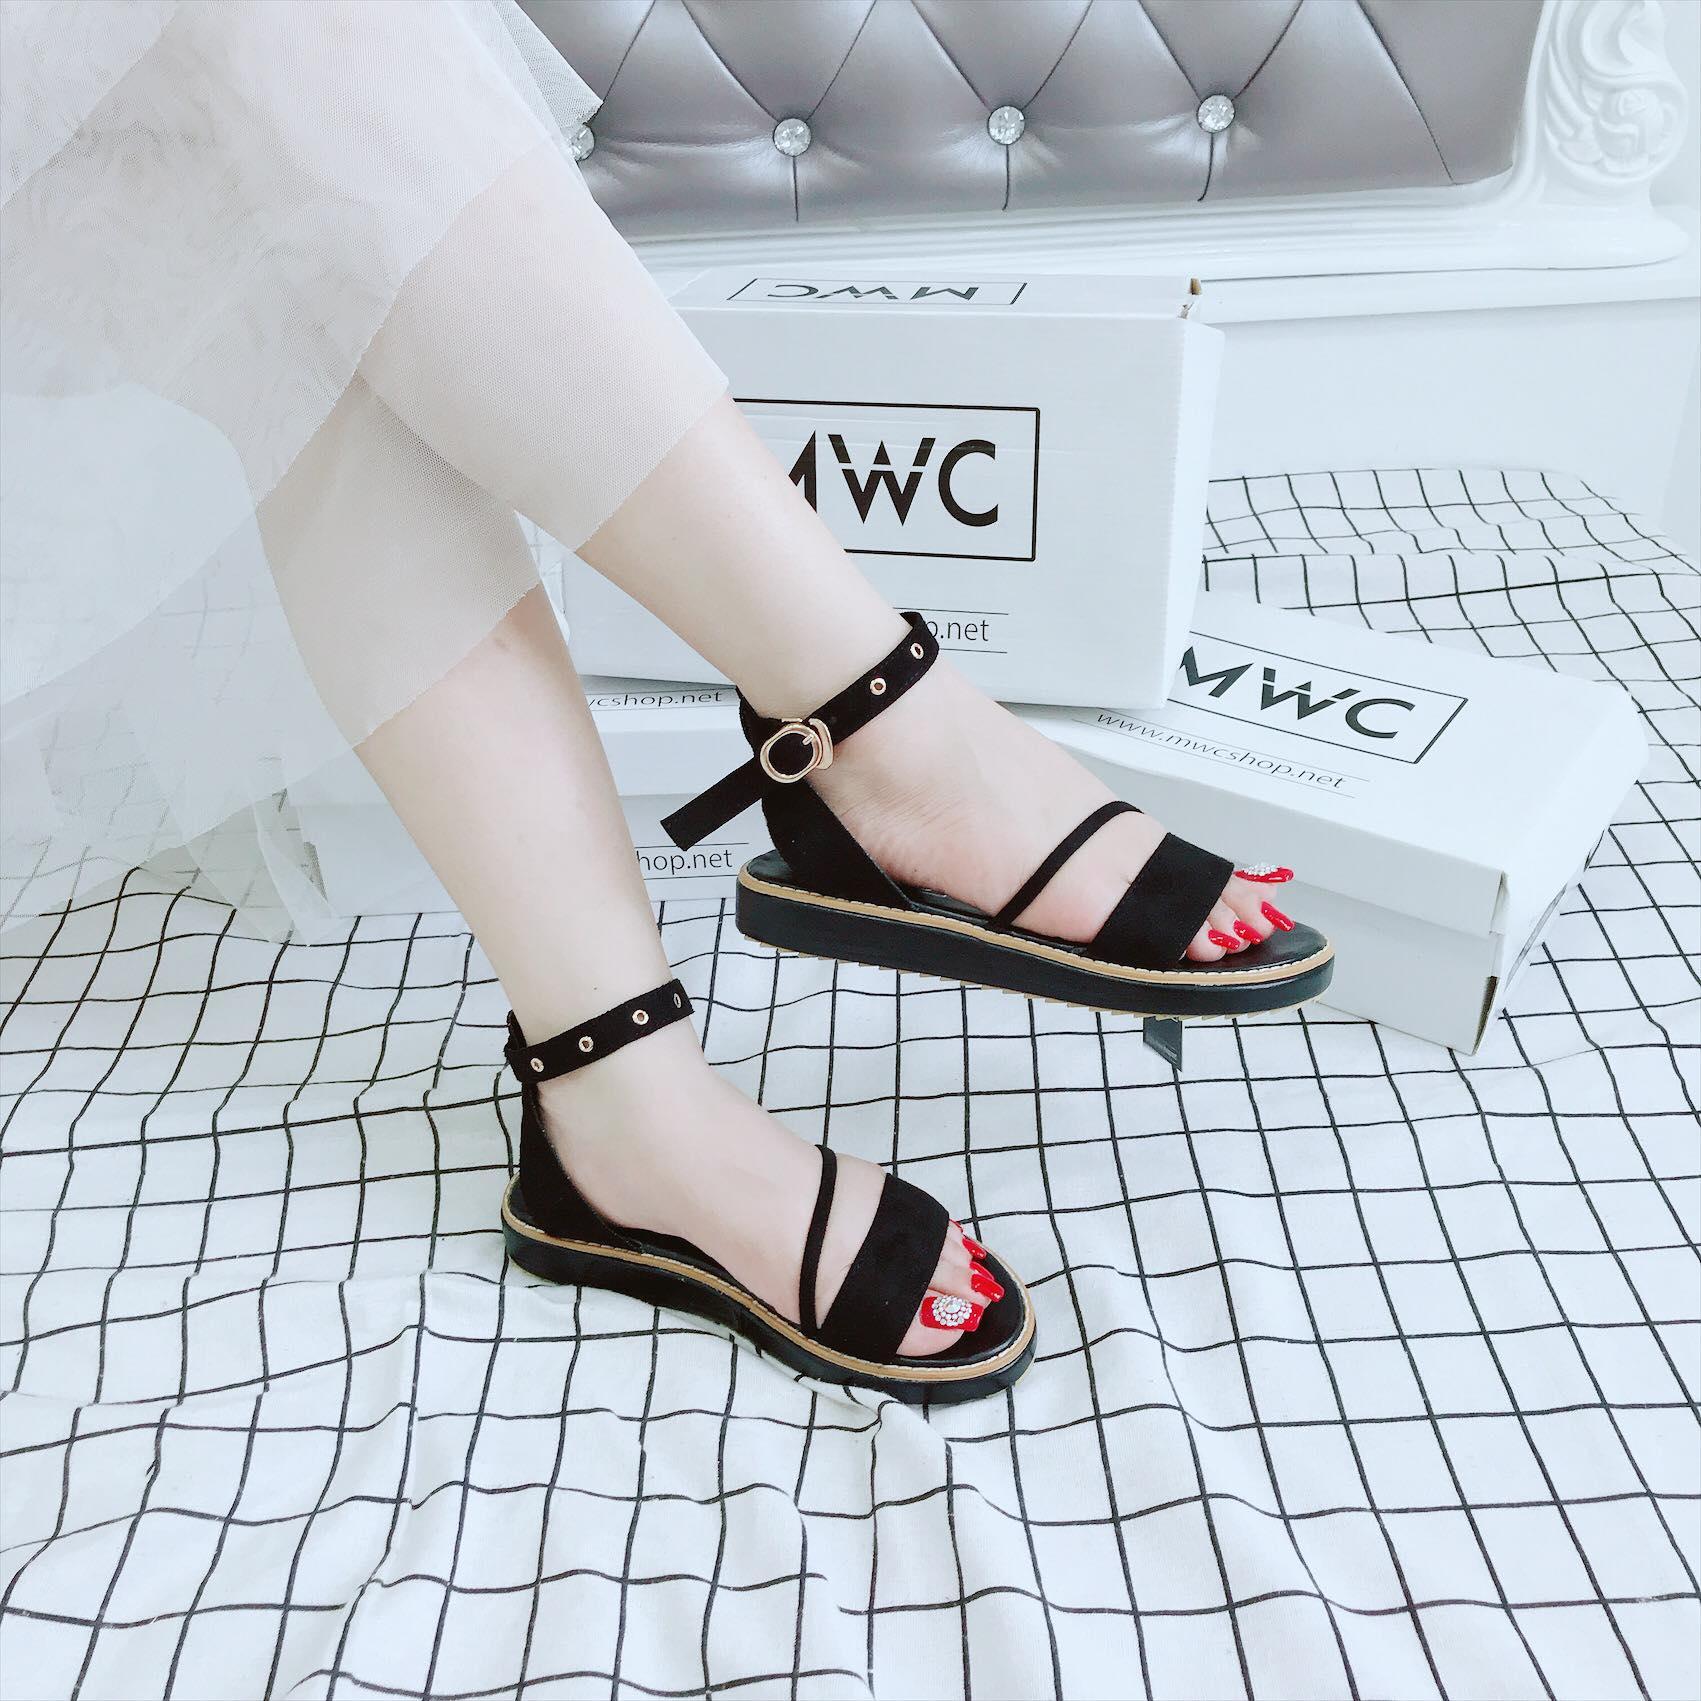 Giày sandal nữ MWC NUSD- 2605 - ĐEN